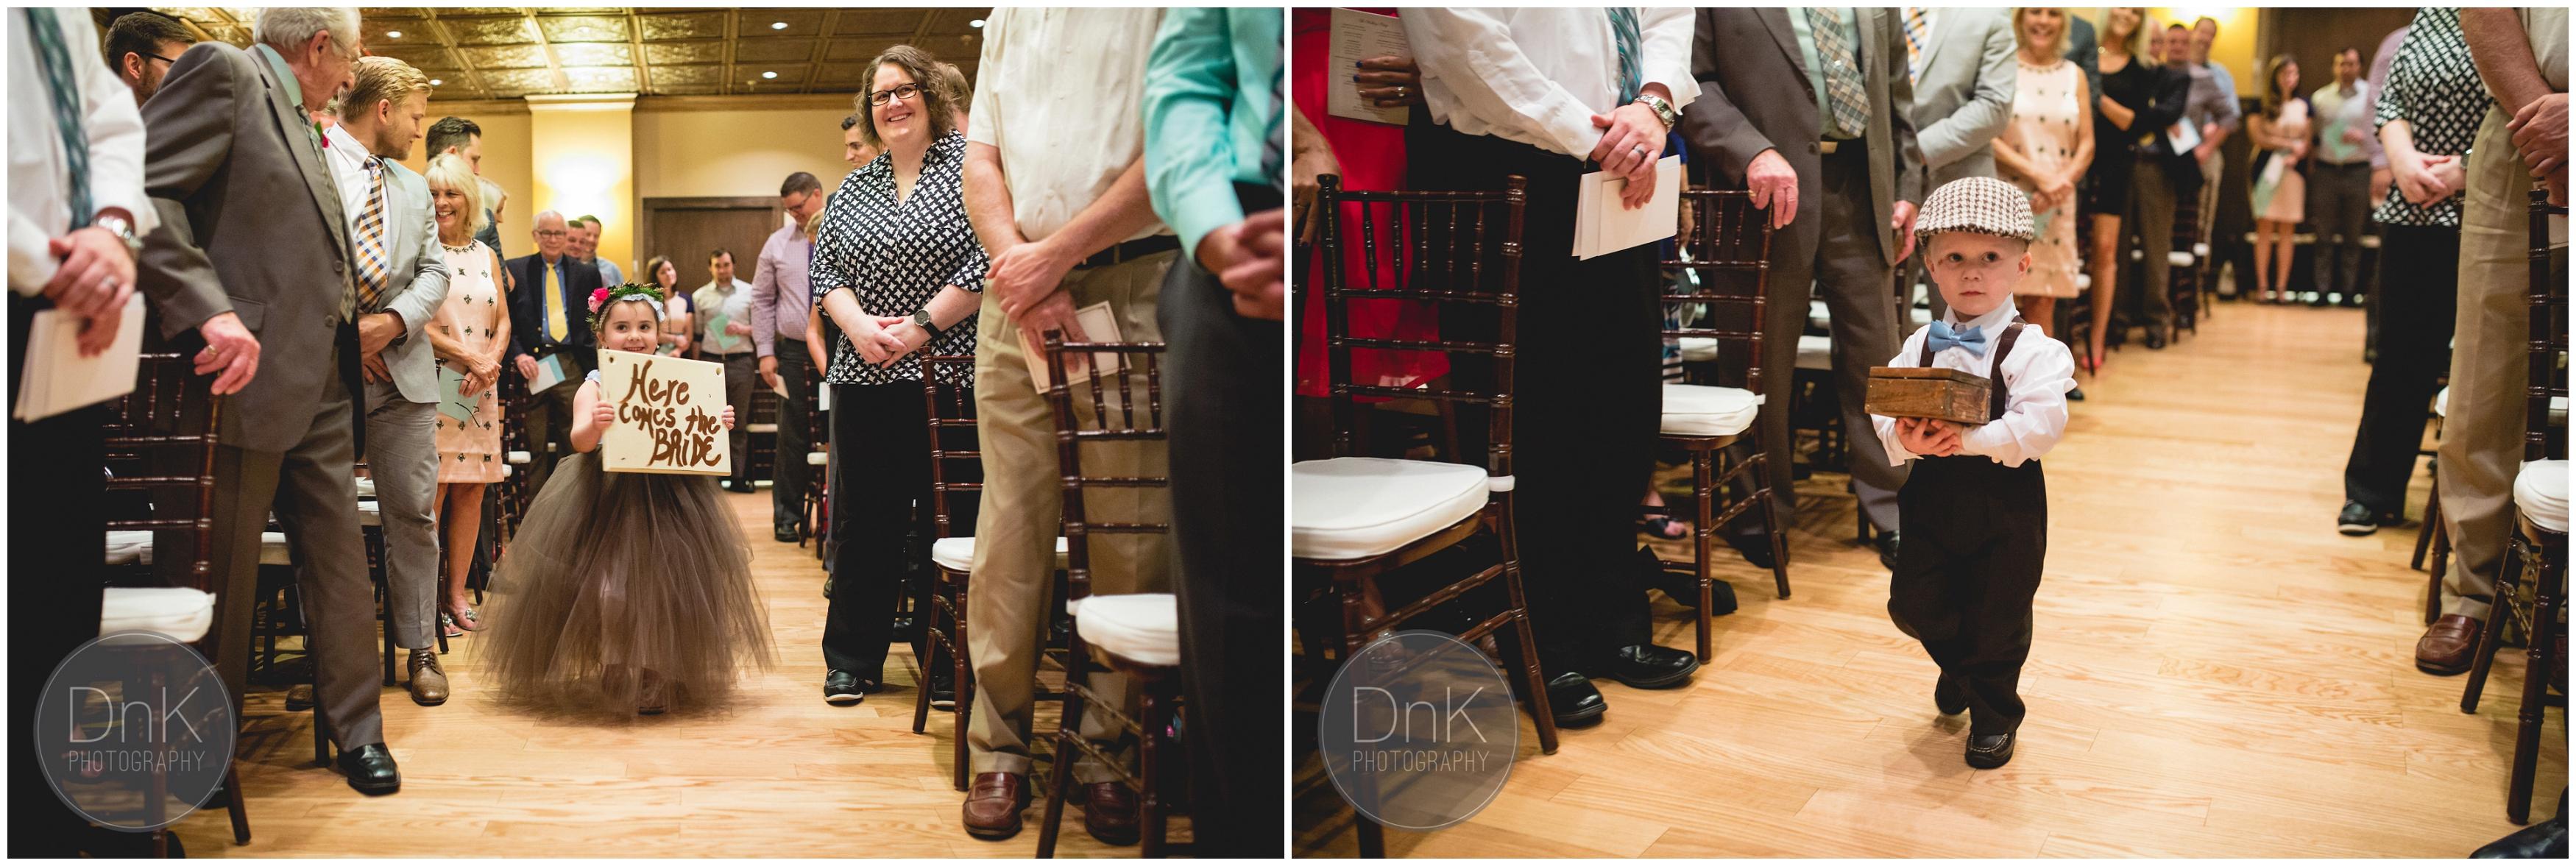 16 - 413 on Wacouta Wedding Ceremony